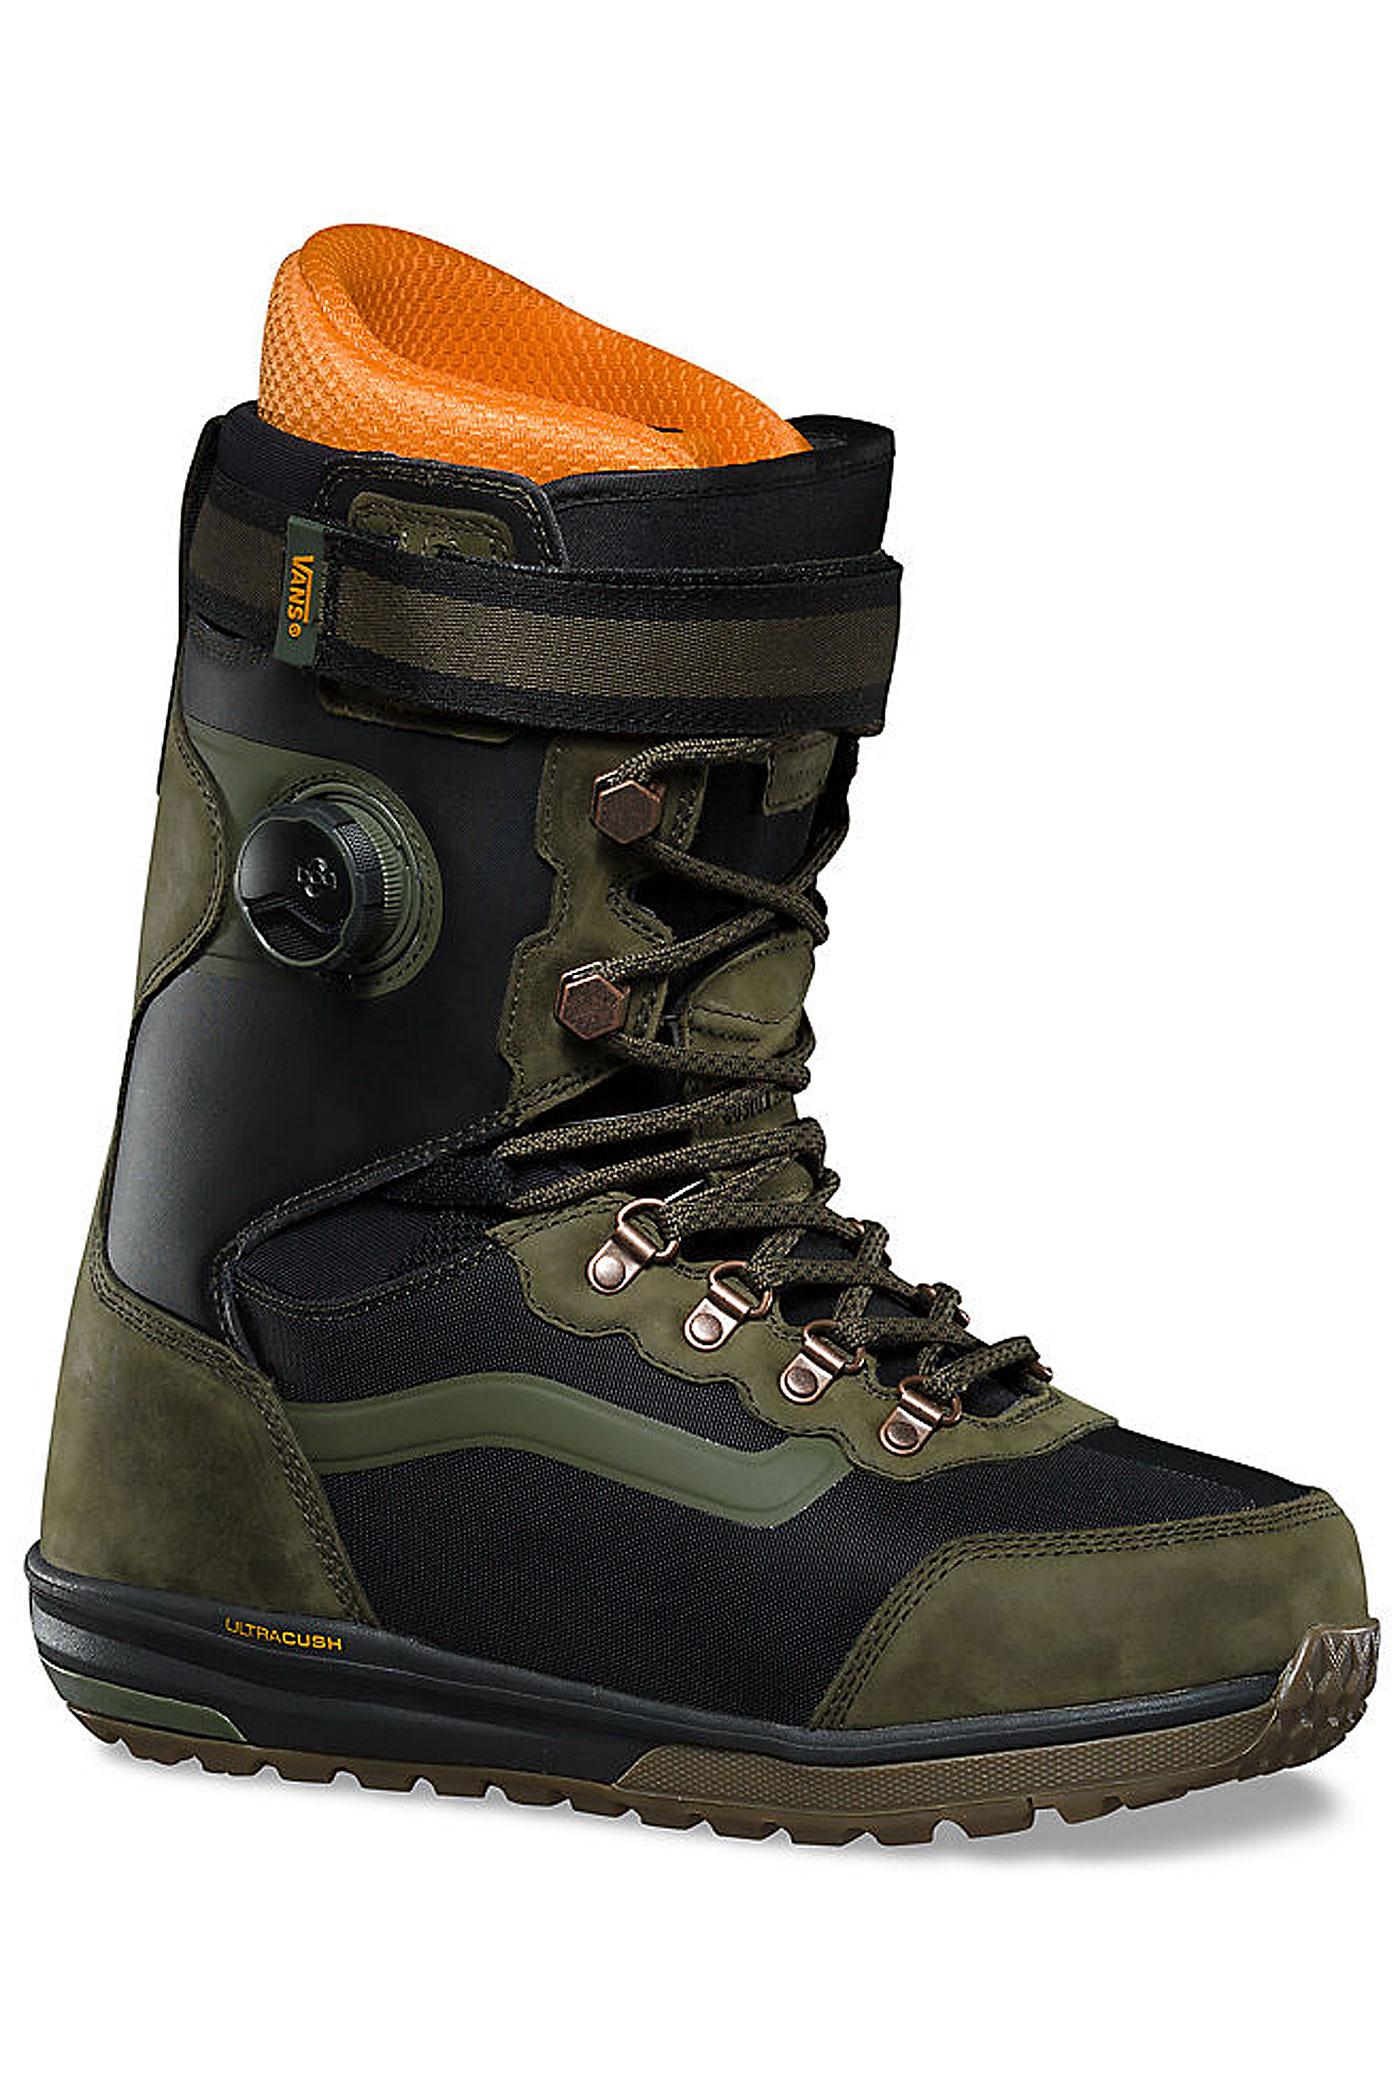 vans snowboard boots mantra